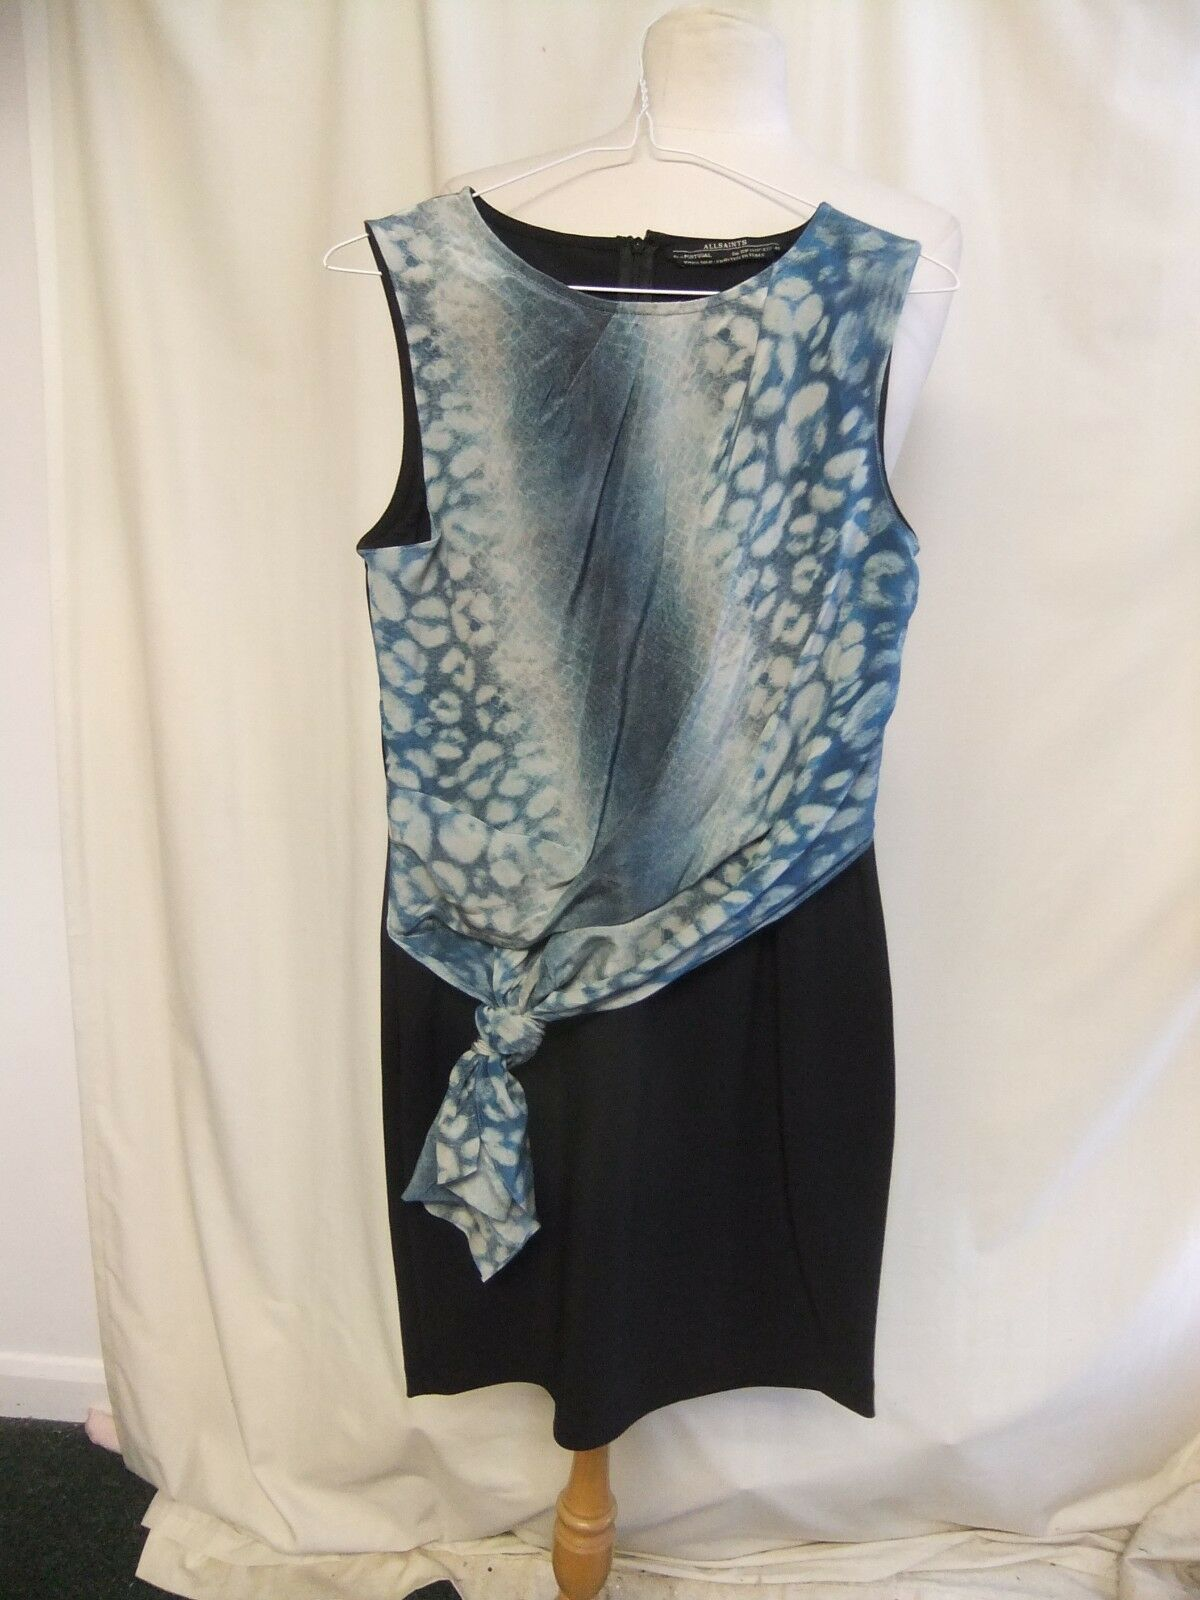 Ladies Dress Dress Dress AllSaints schwarz with turquoise silk front panel UK 12 EU 40 2136 3ae1bf